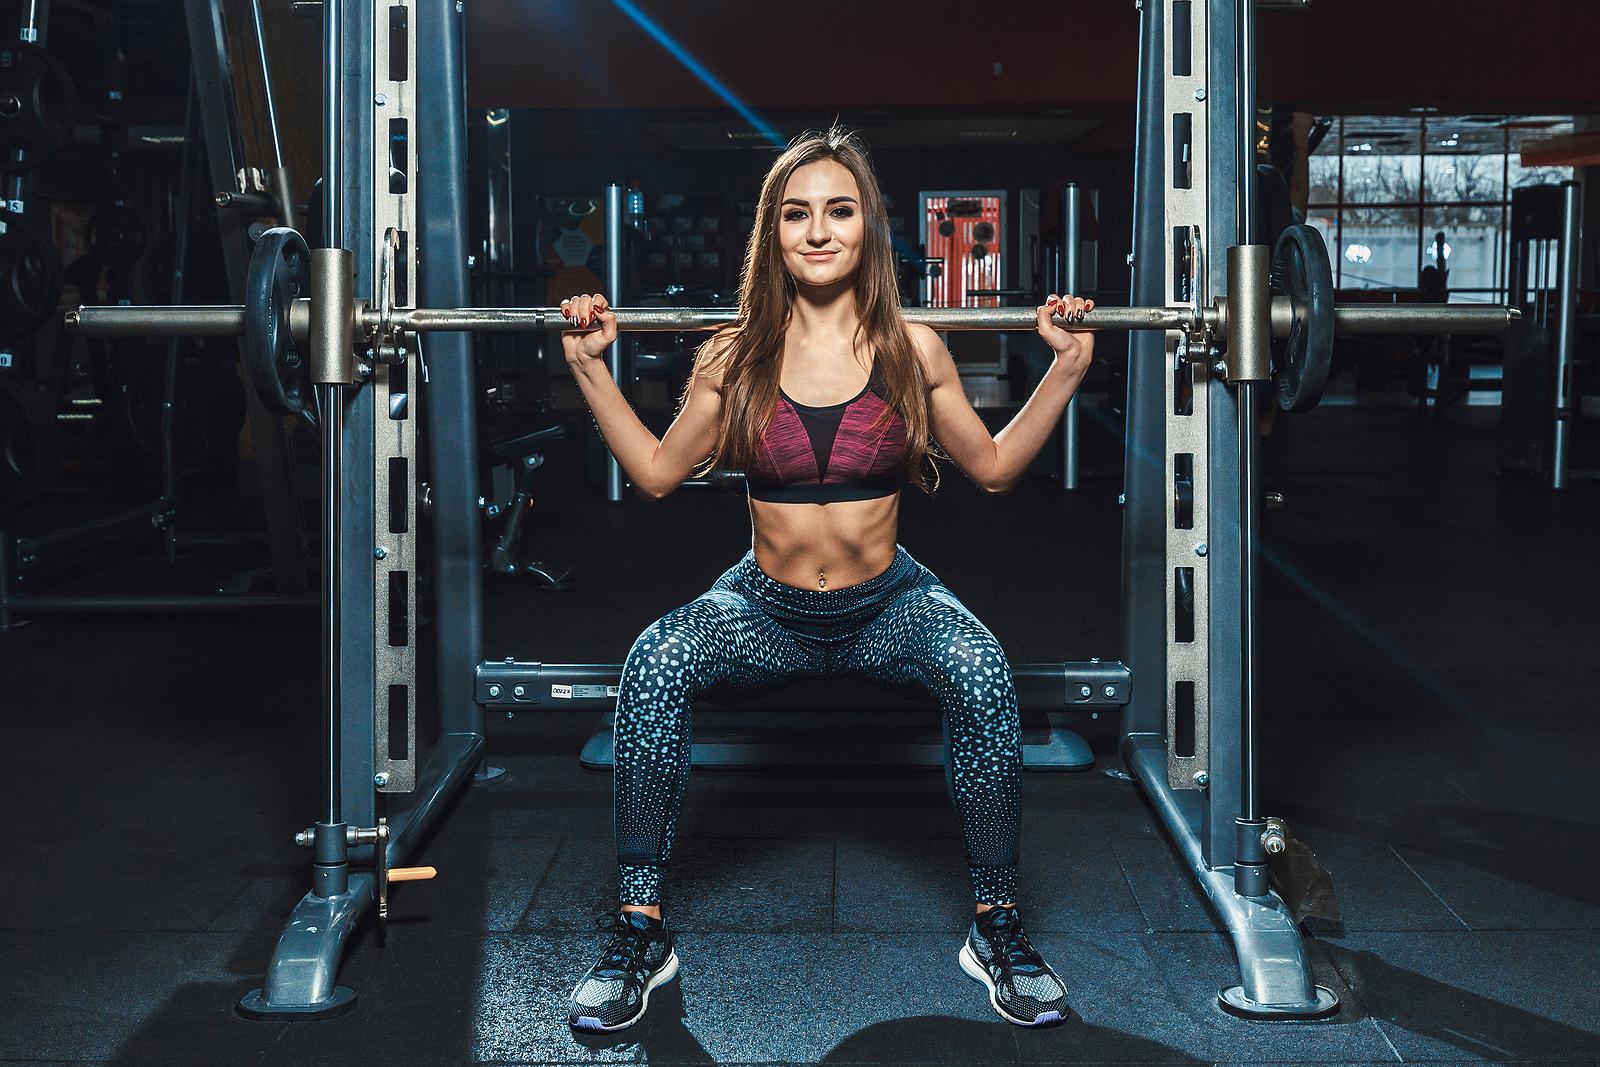 Smith machine squat